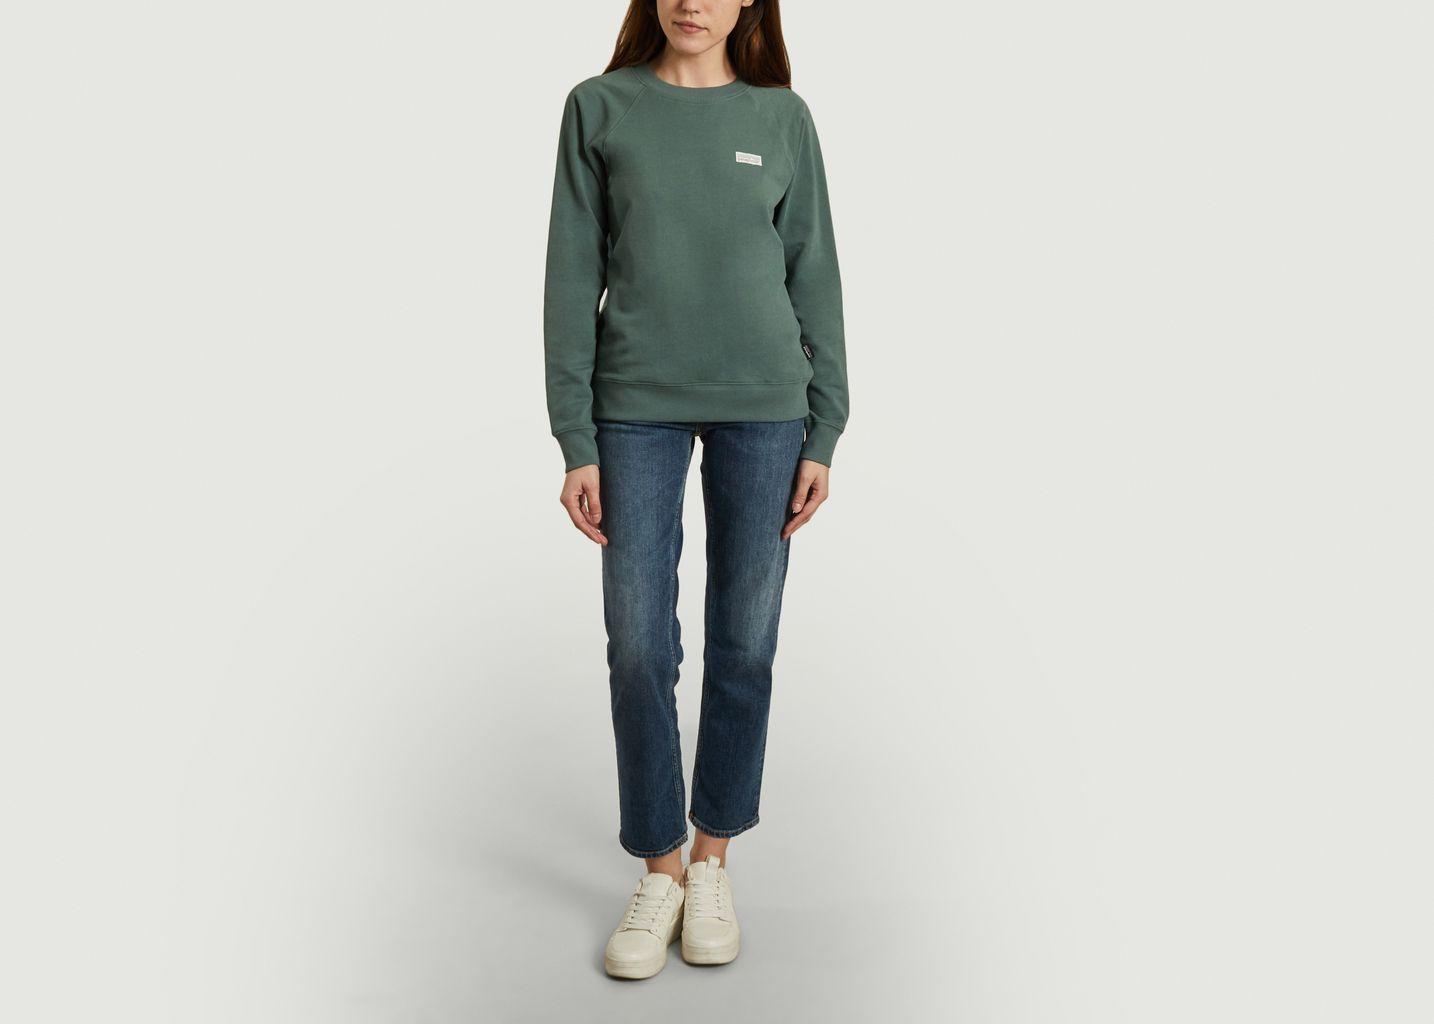 Sweatshirt Pastel P-6 Label Anhya  - Patagonia